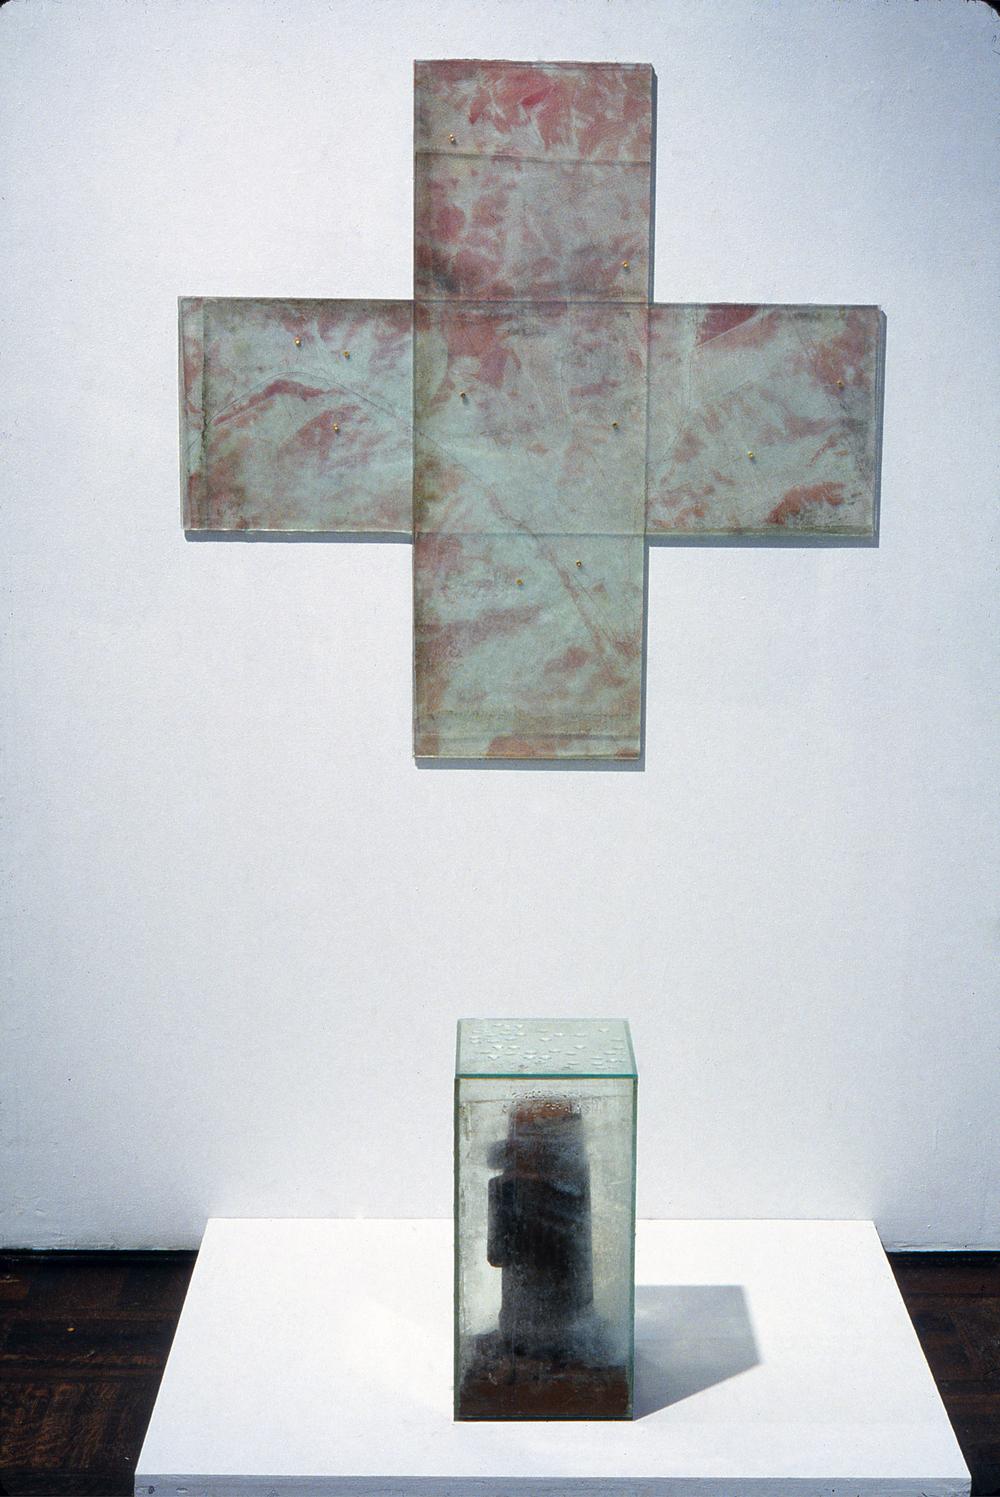 Transfusion, 1993